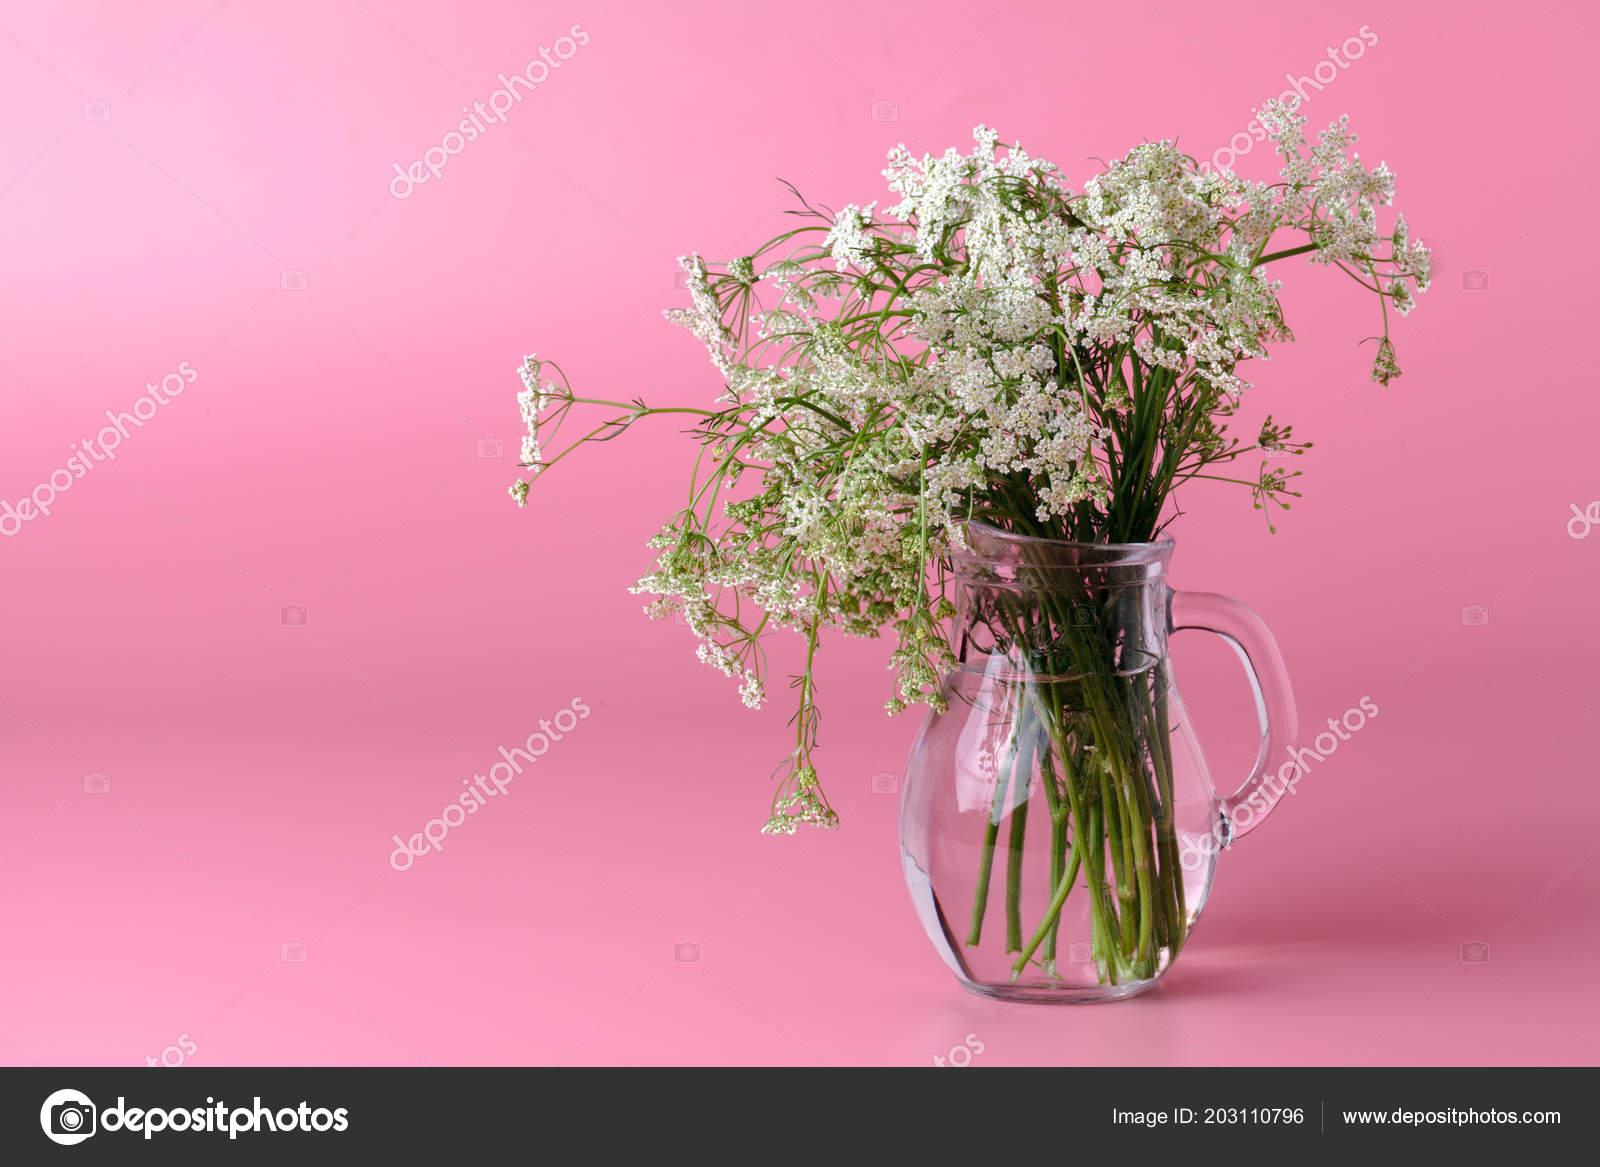 Small fragrant spring flowers stock photo andreycherkasov 203110796 small fragrant spring flowers stock photo mightylinksfo